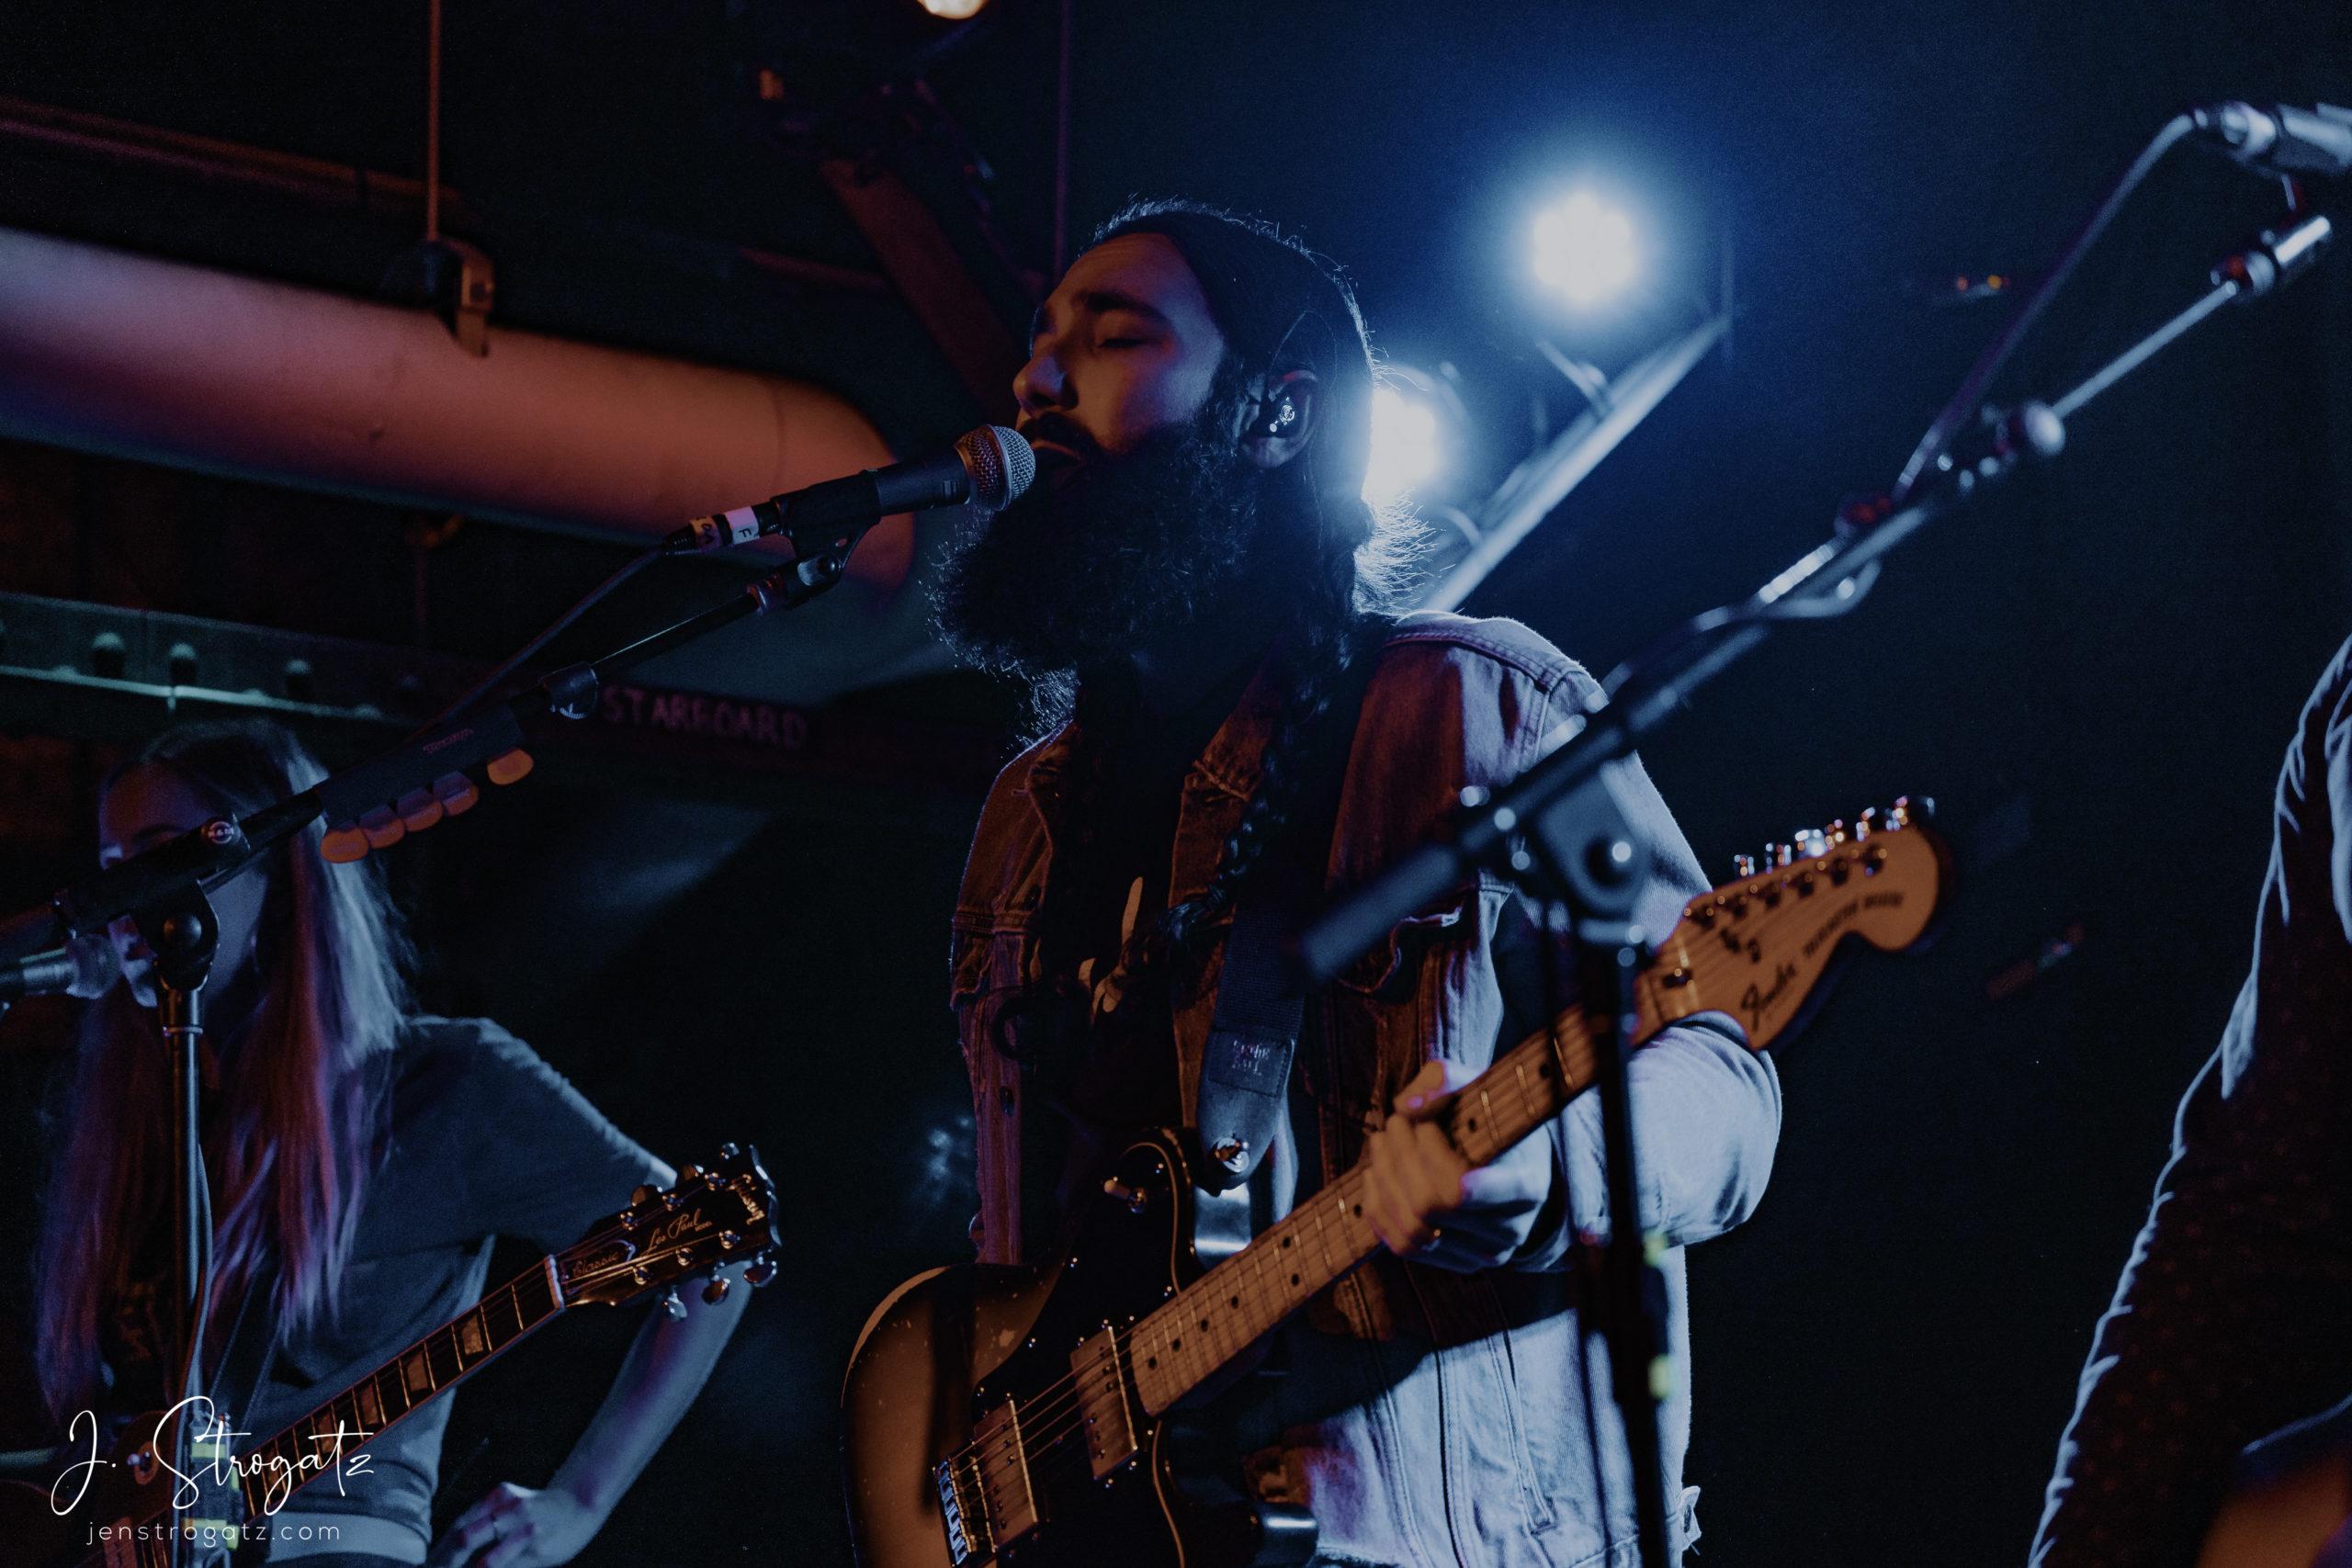 Ron Pope at The Foundry photo - Jen Strogatz